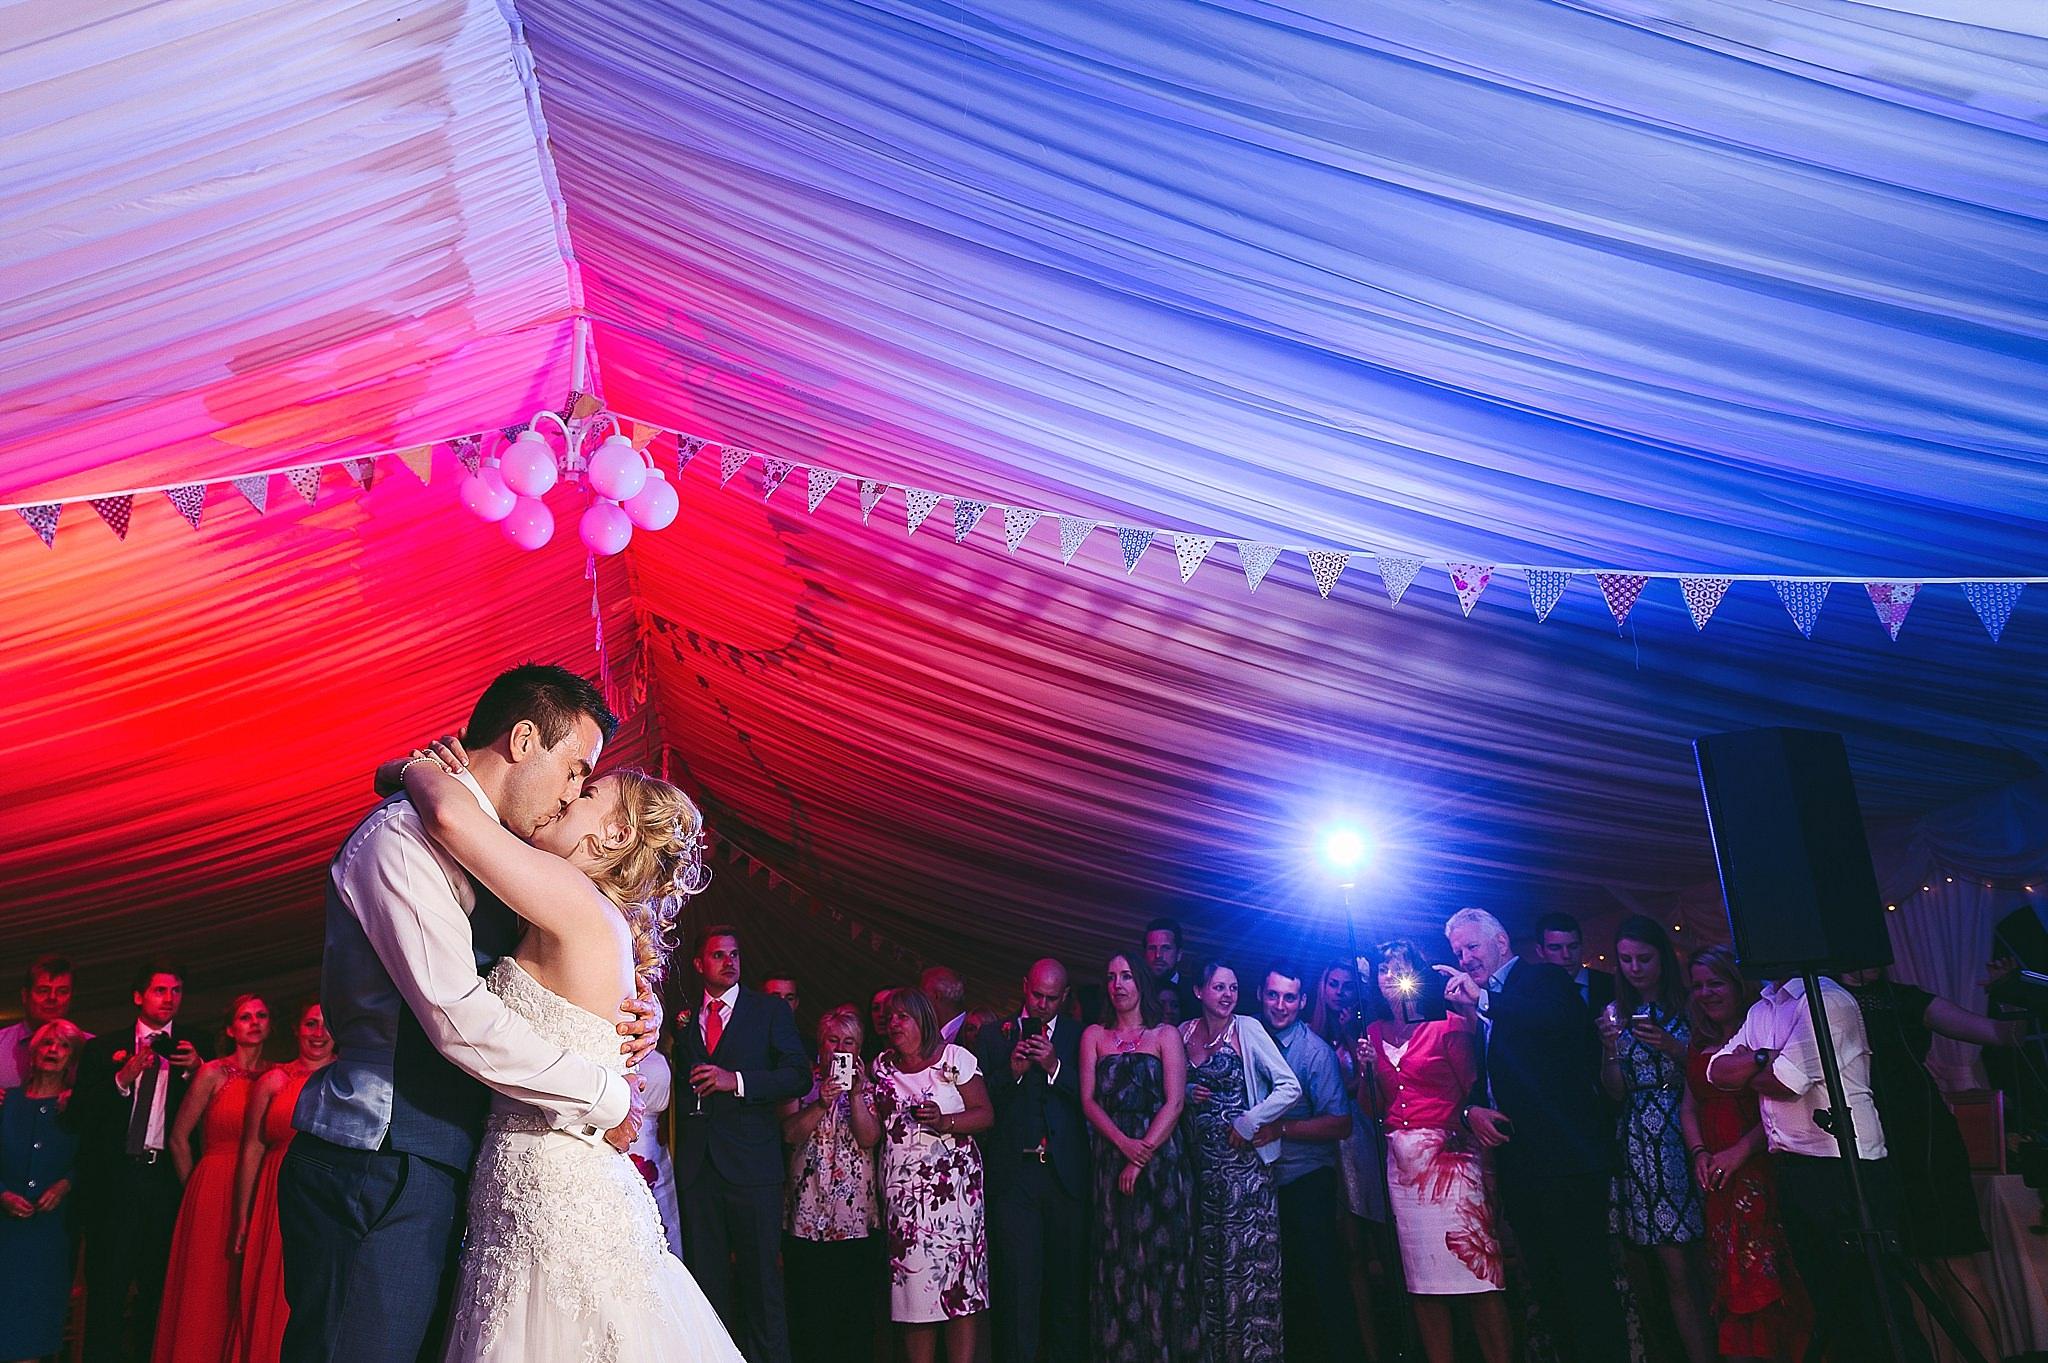 aga-tomaszek-wedding-photographer-cardiff-2016_1076